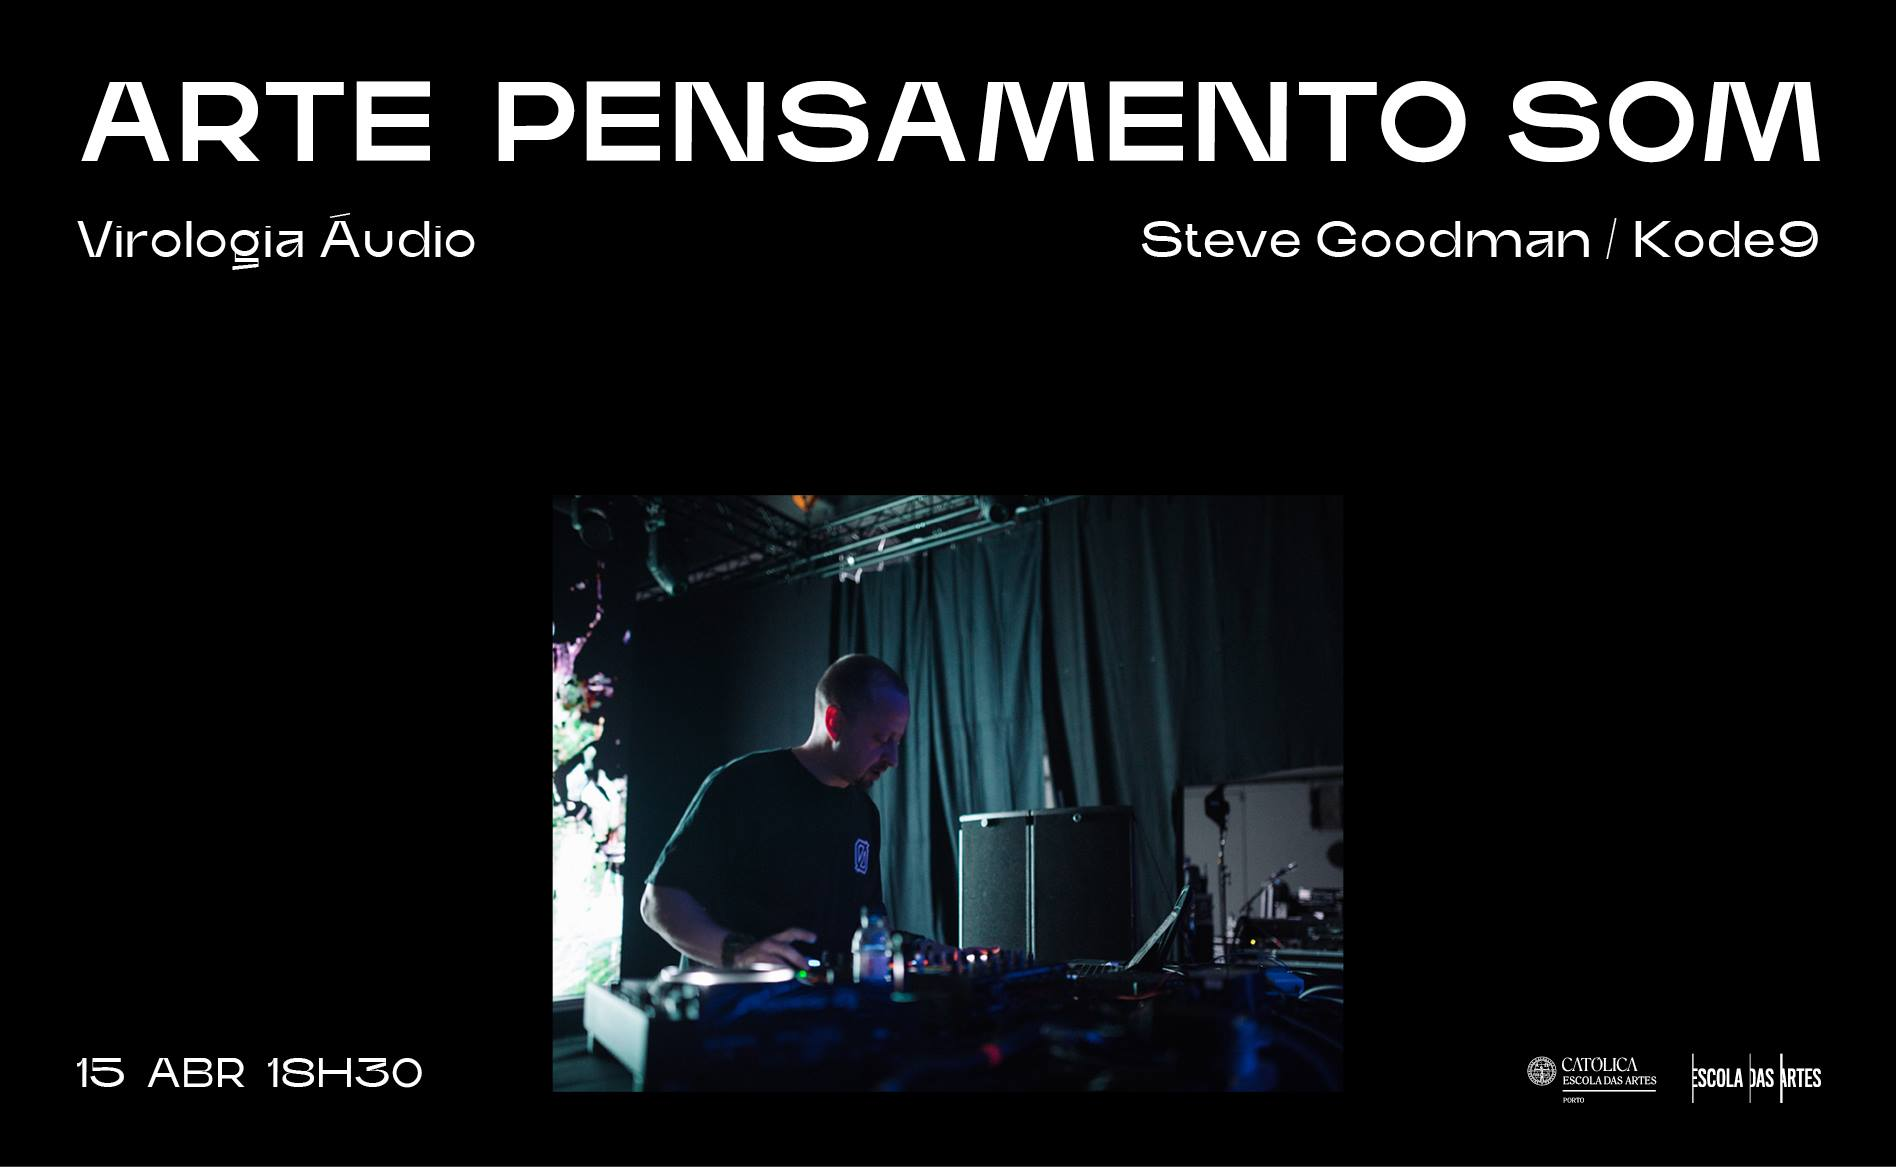 Steve Goodman / Kode9 · Virologia Audio